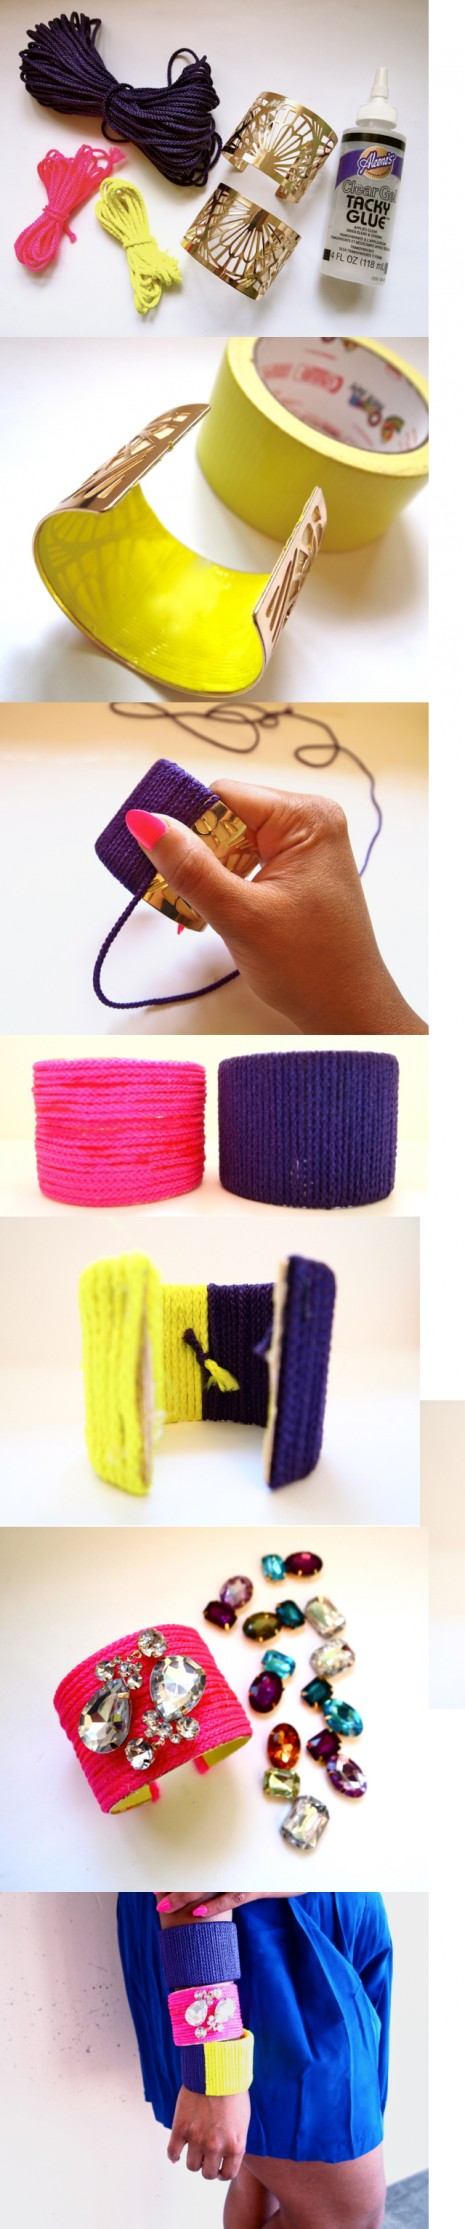 diy-accessories